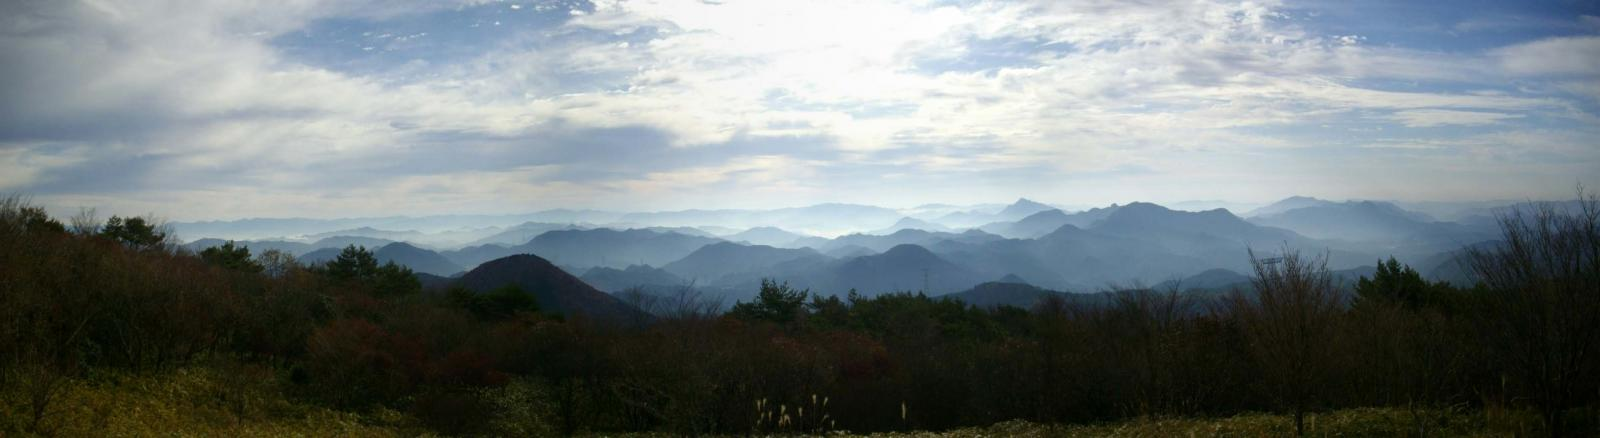 富士見の眺望